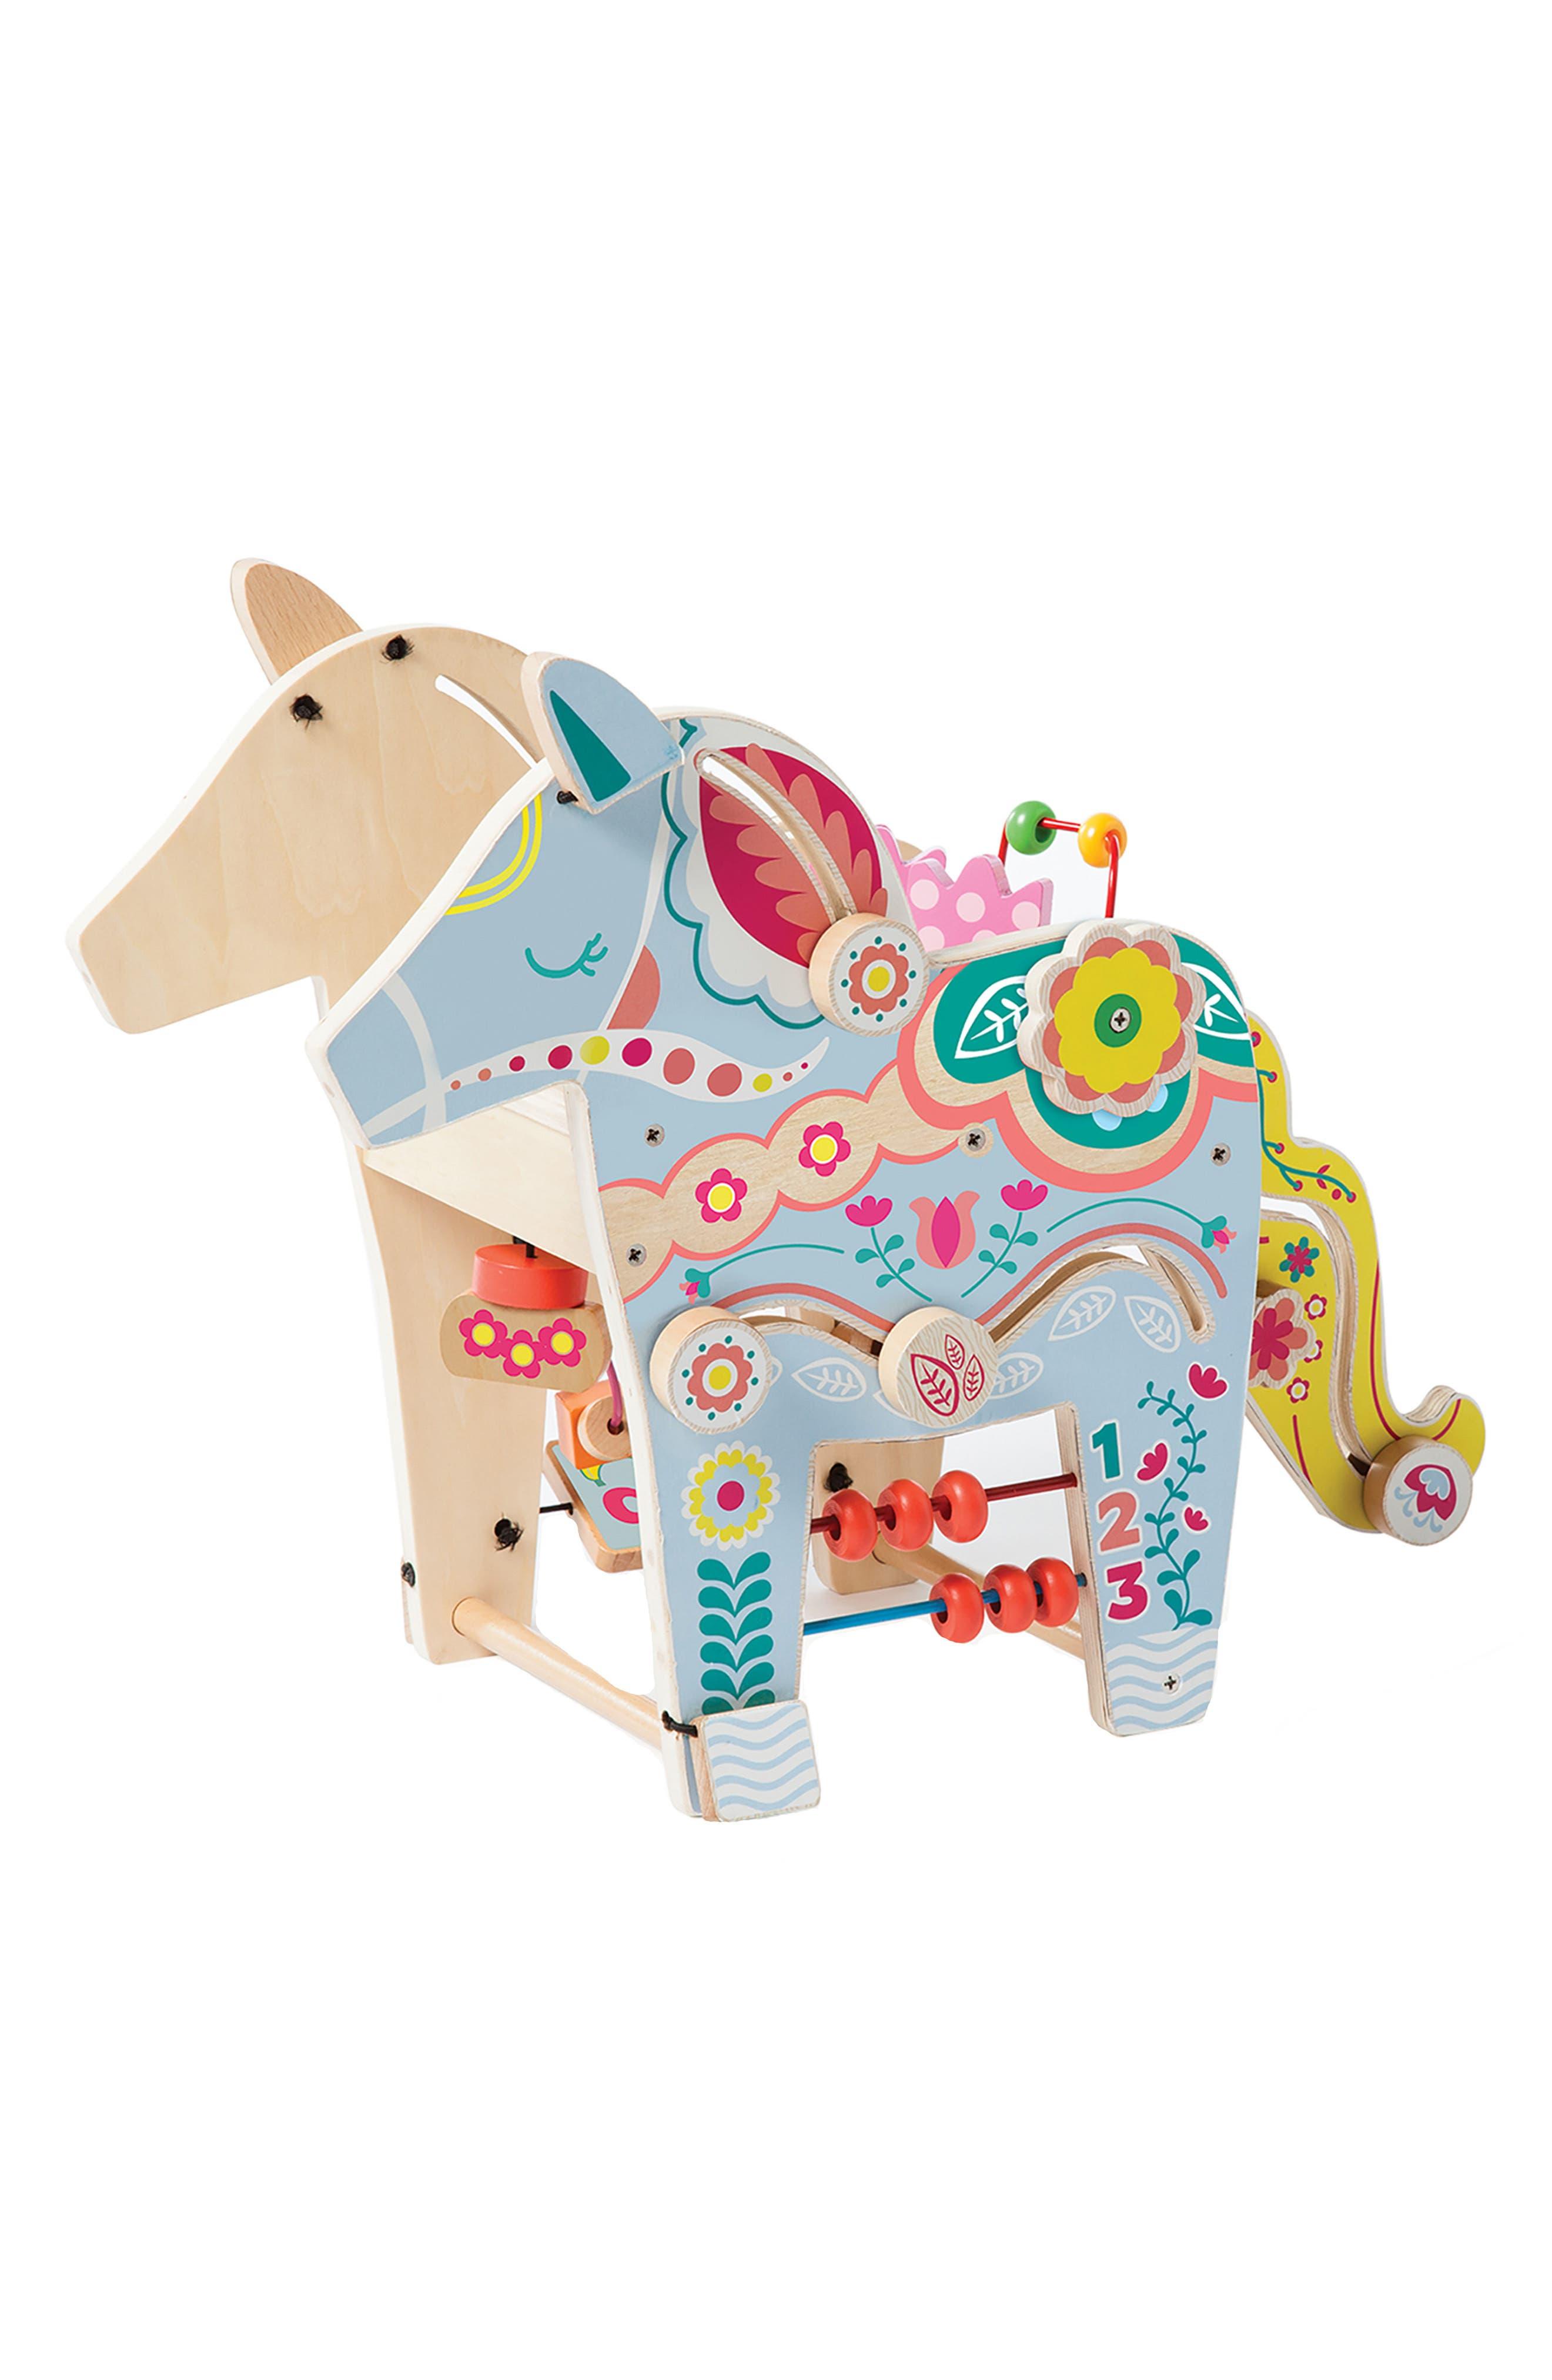 Wooden Playful Pony Activity Center,                             Main thumbnail 1, color,                             Blue